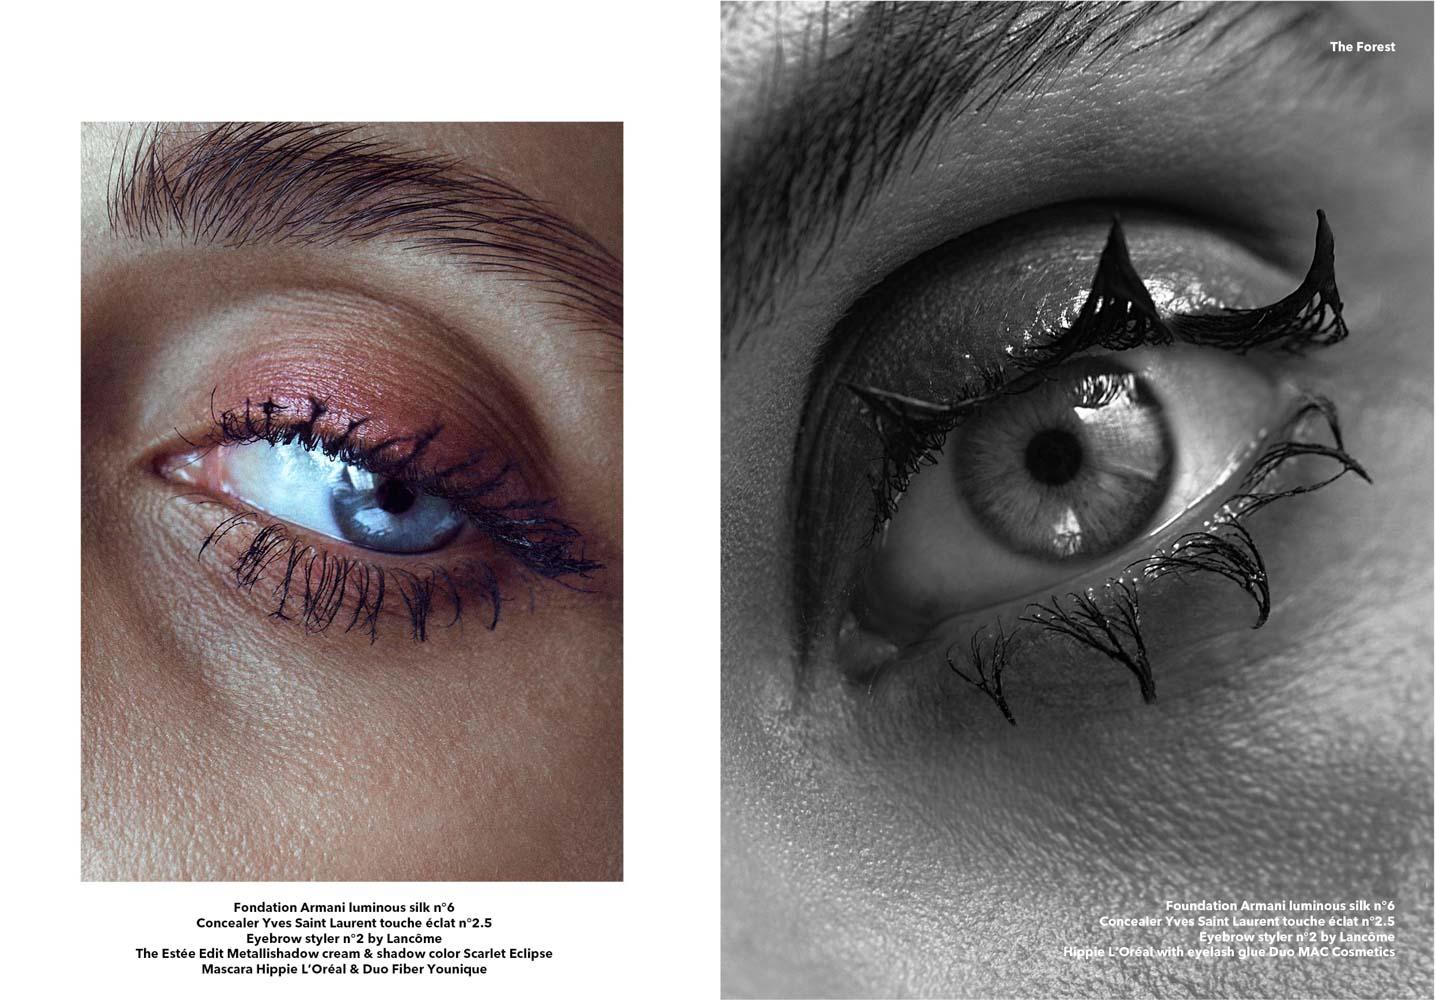 the_forest_magazine_ludovine-jamin_alexiane-guyon_0004